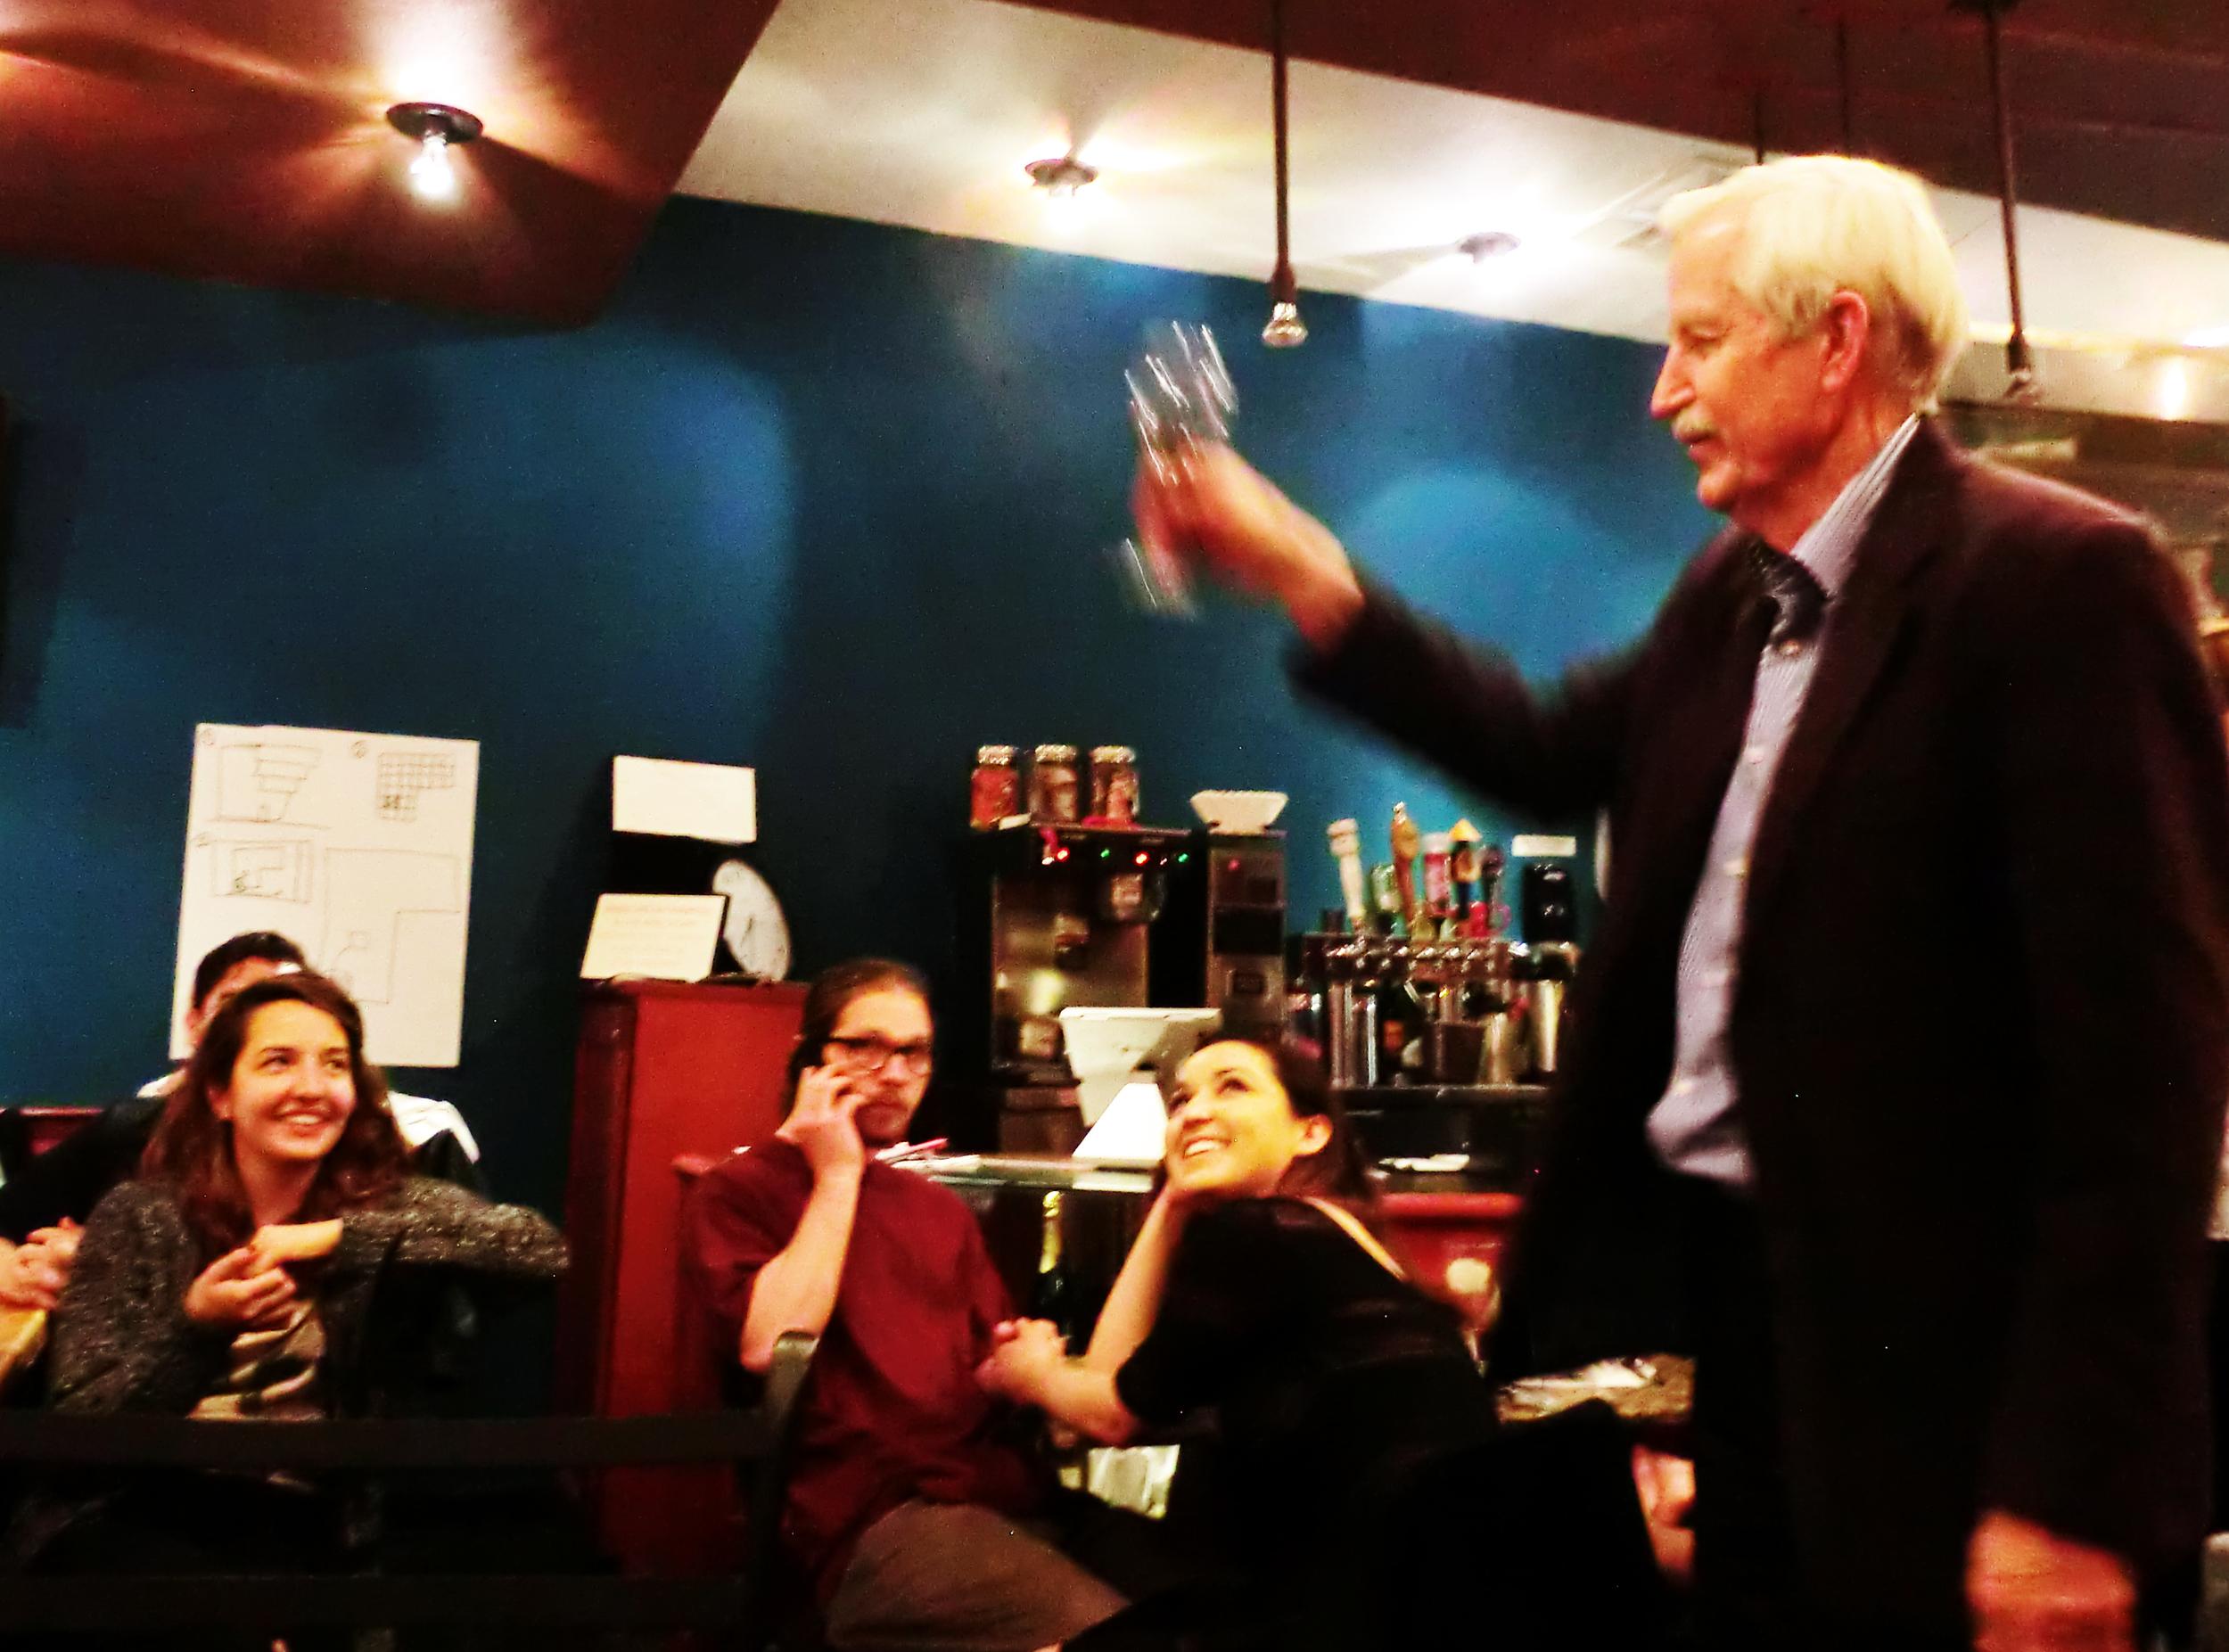 A toast from trivia judge, Roger Schluntz.